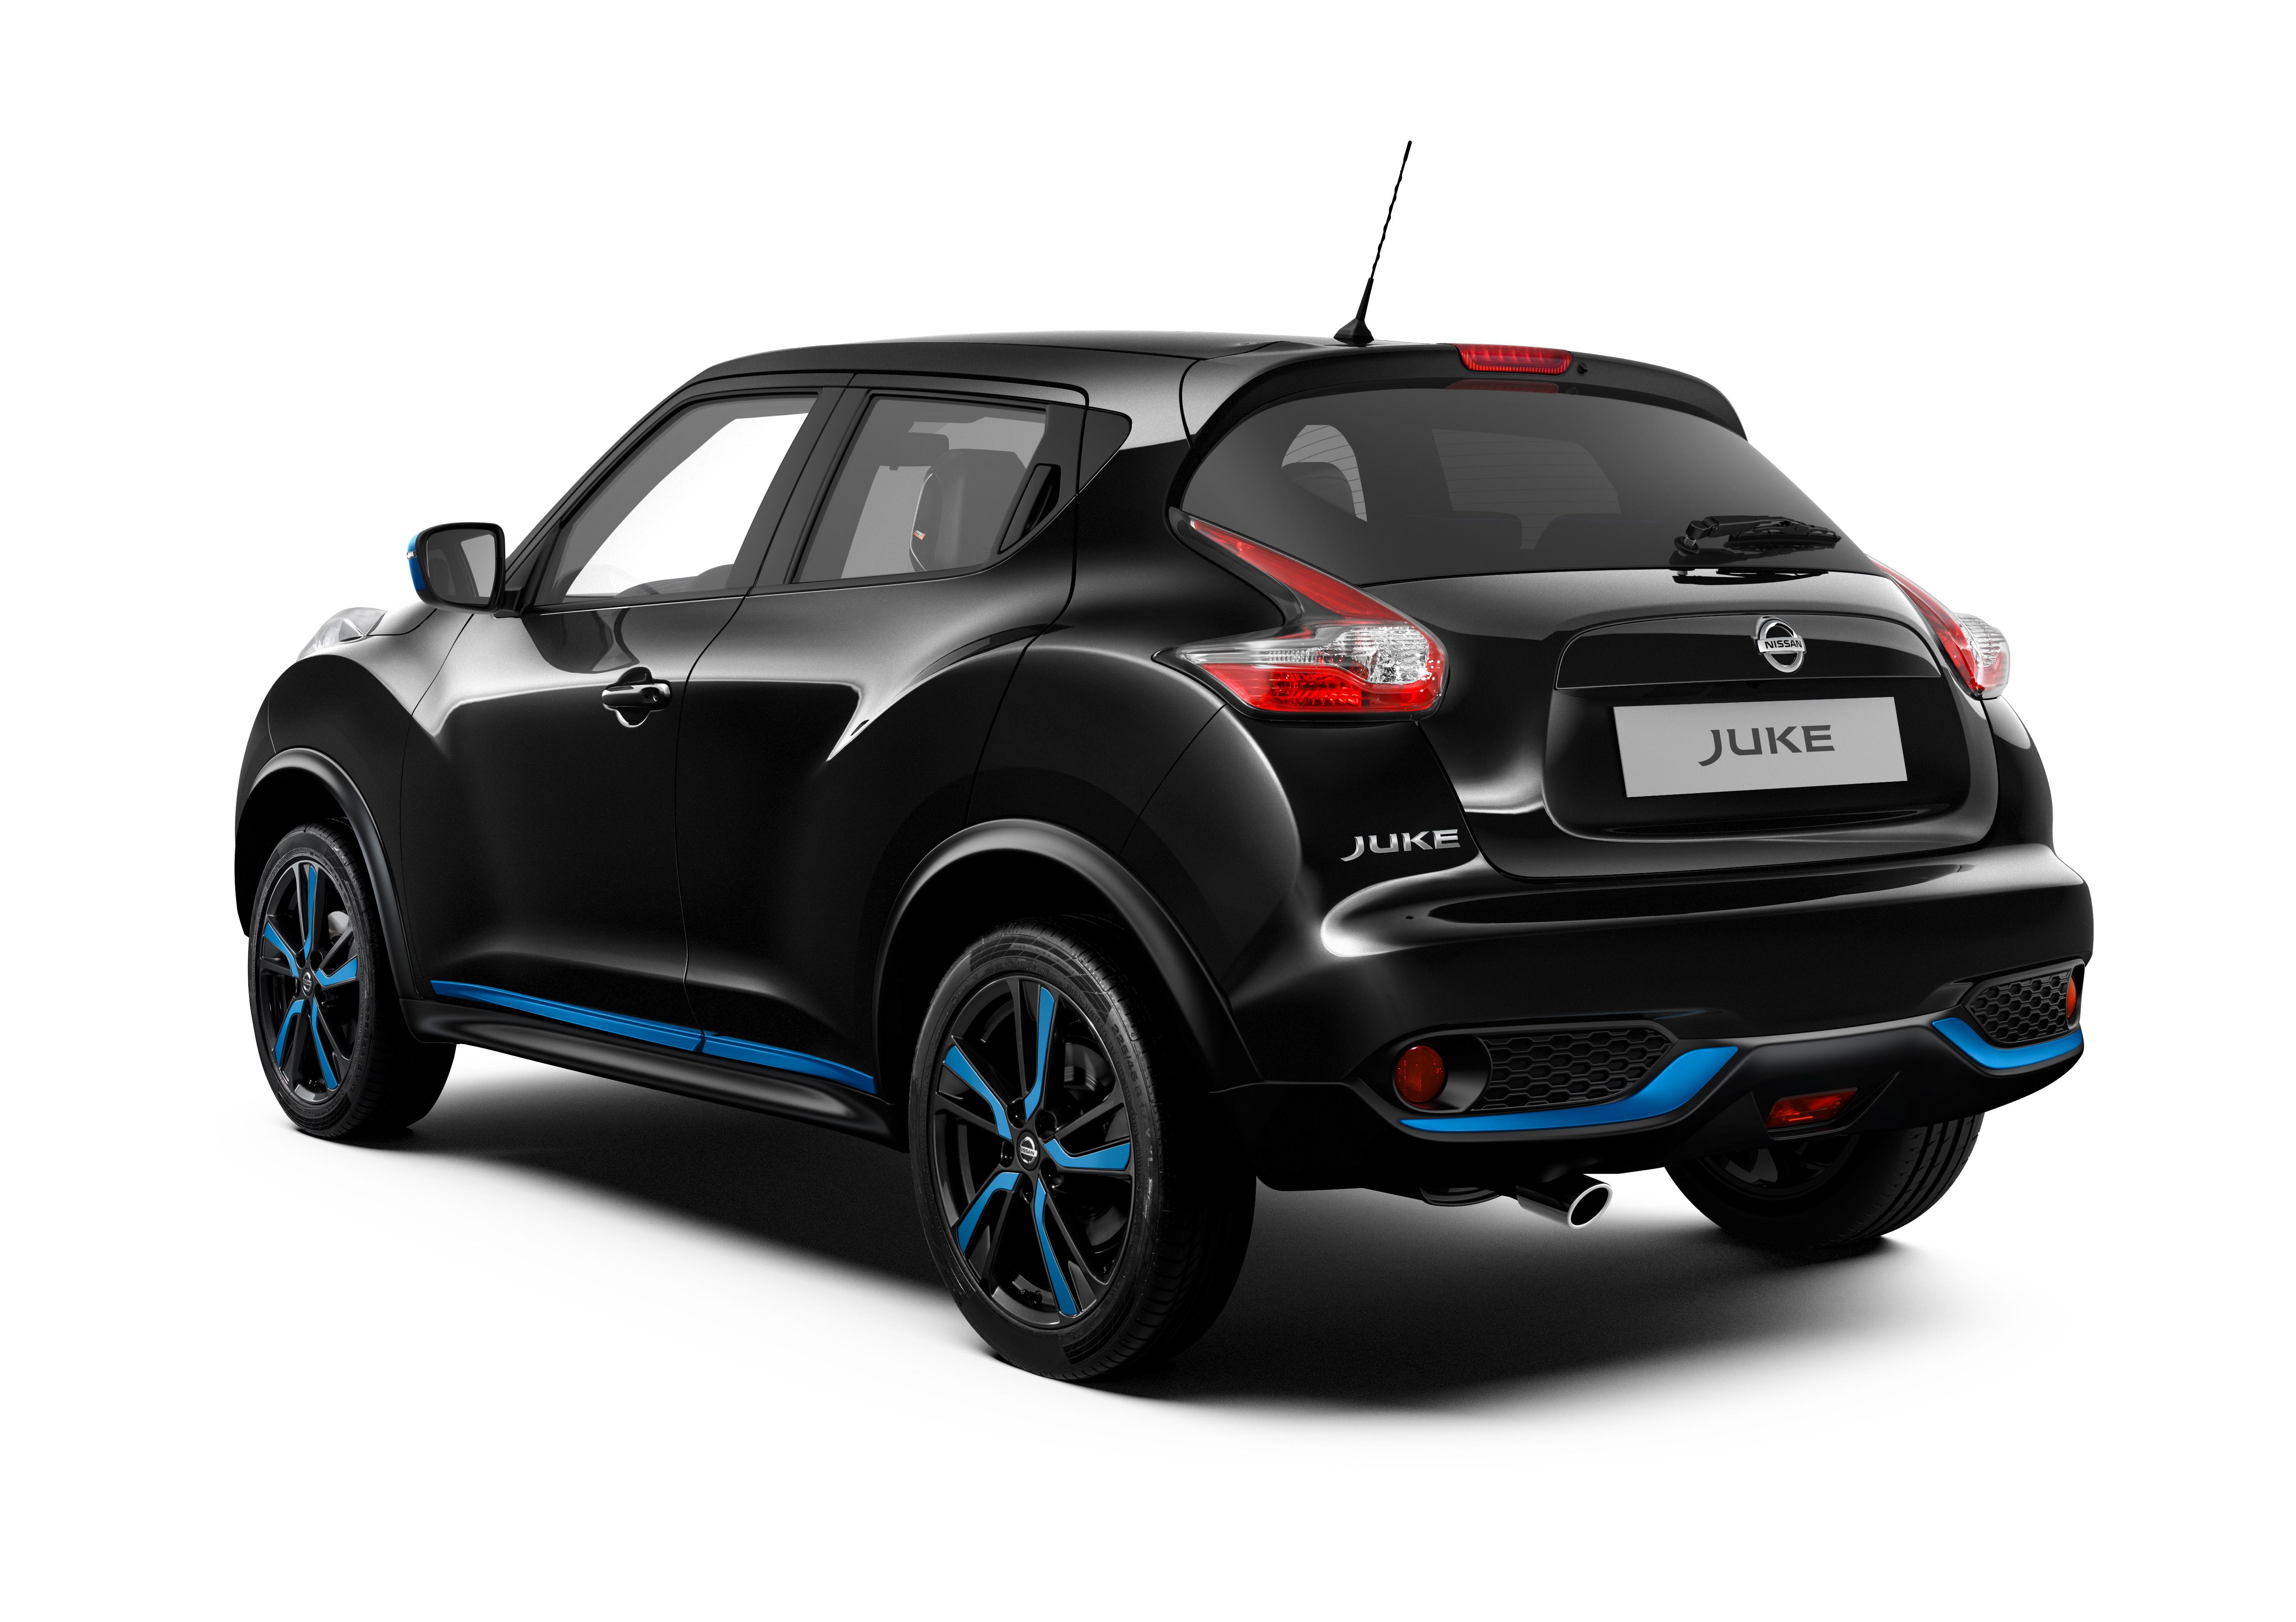 Nissan Juke MY 2018 inizio vendite italia